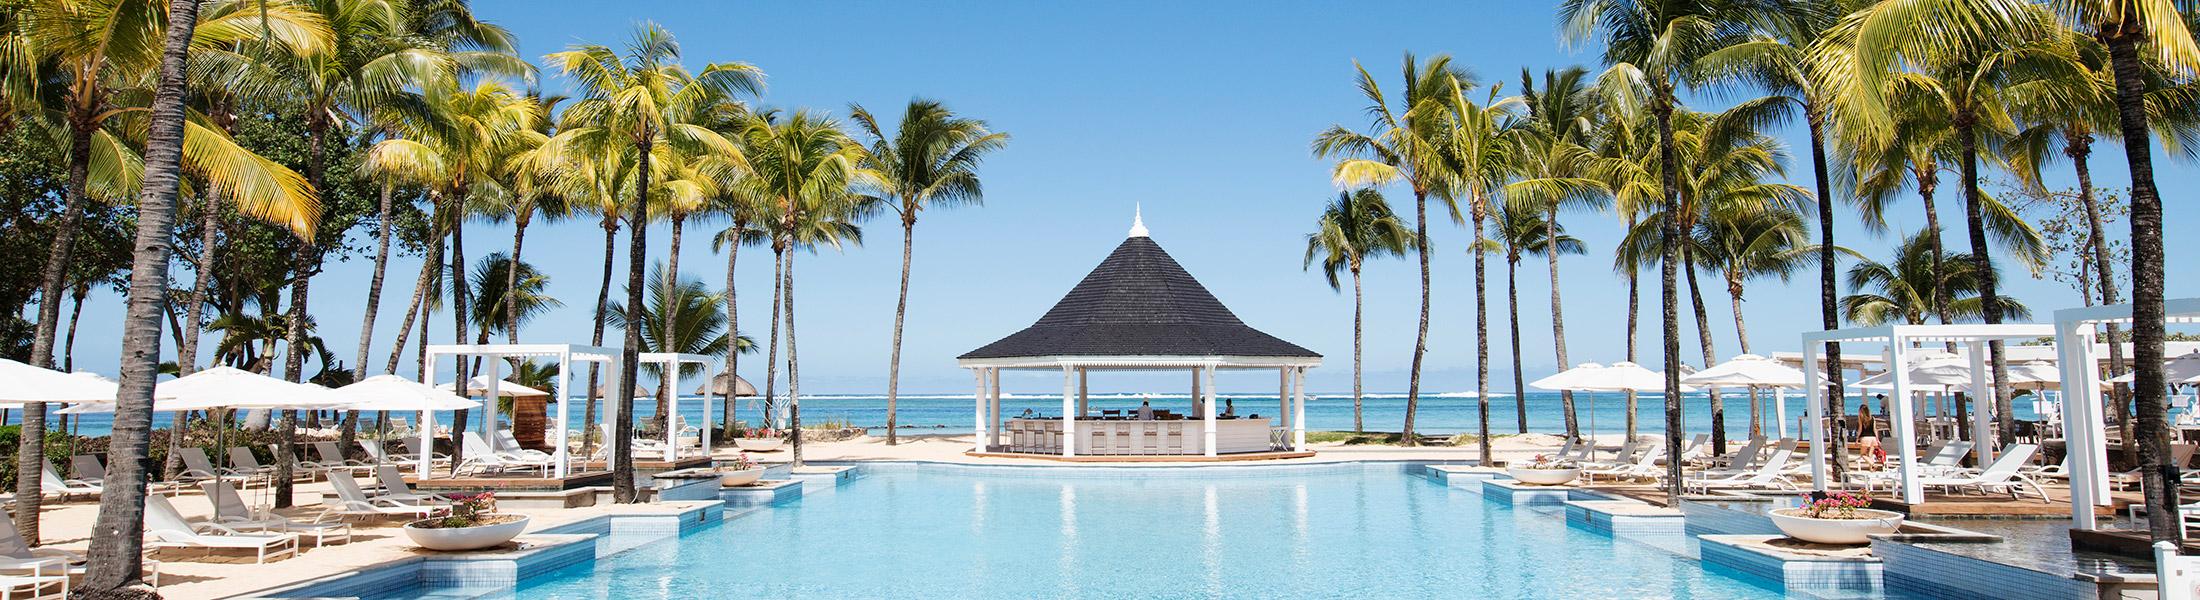 Main pool and bar at Heritage Le Telfair Mauritius